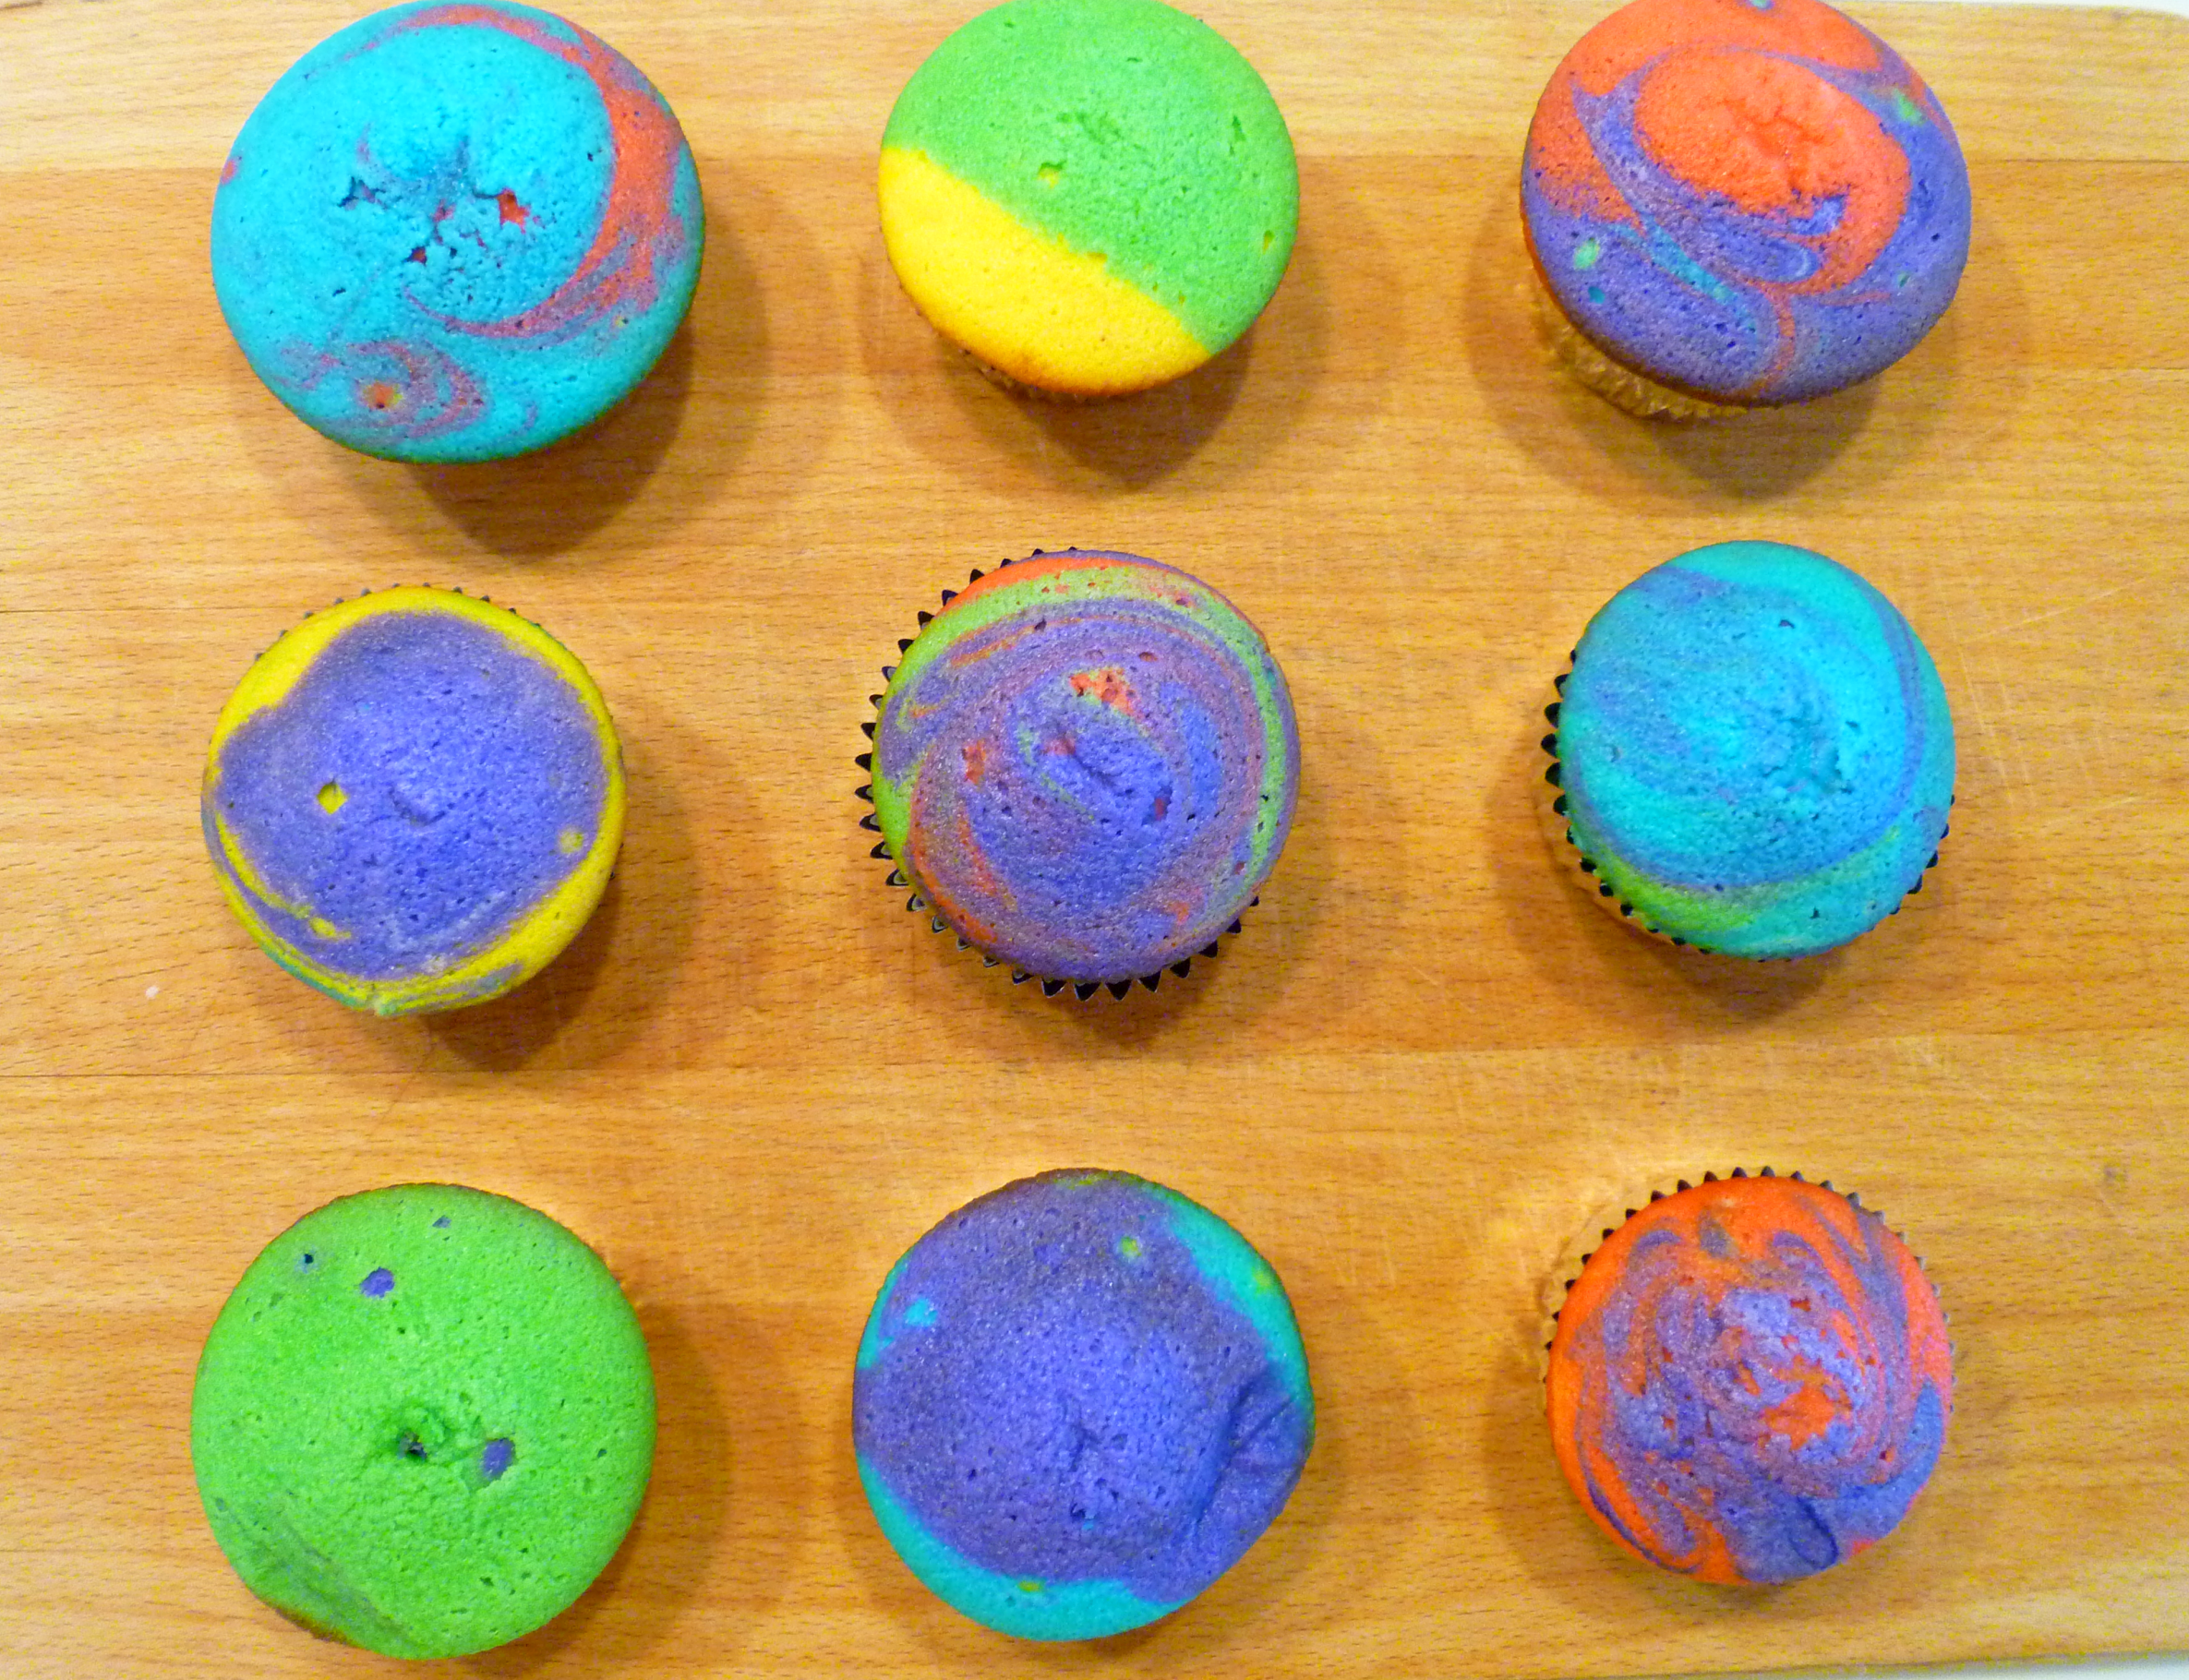 tie-dye cupcakes | The Baking Fairy